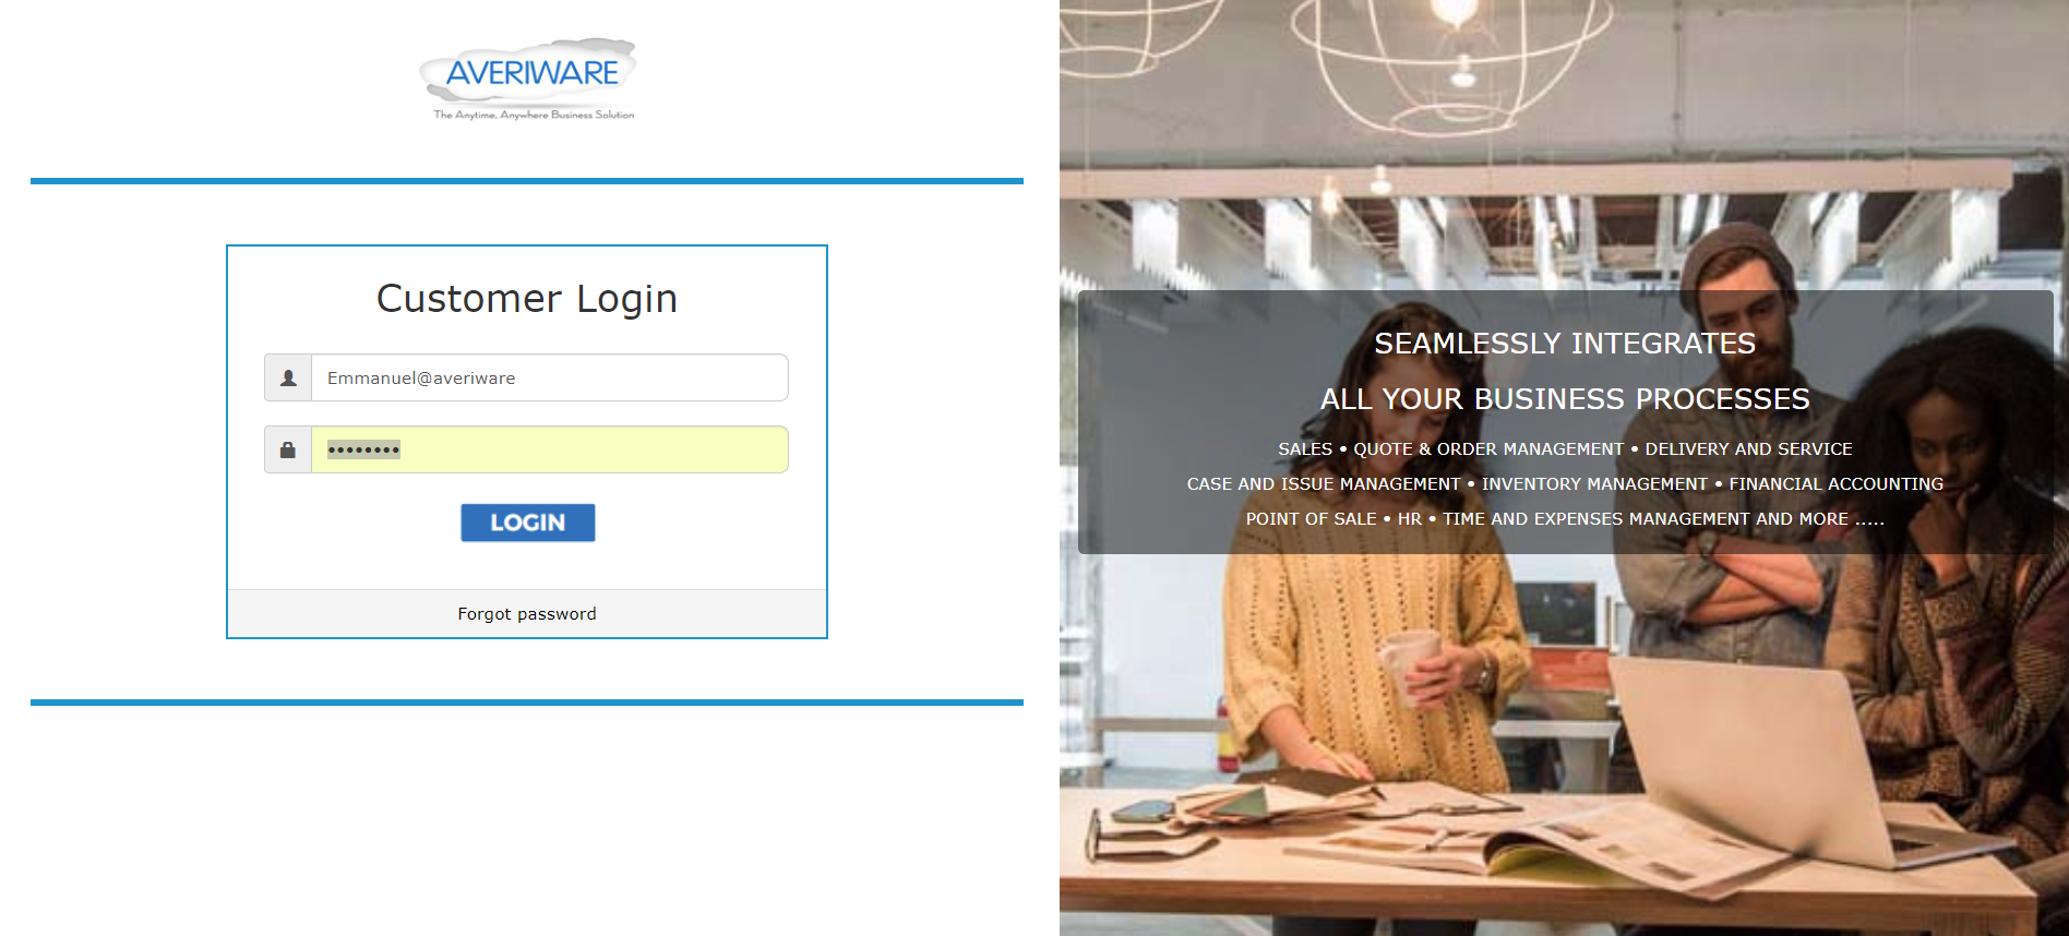 Averiware Software - Averiware Online Portal